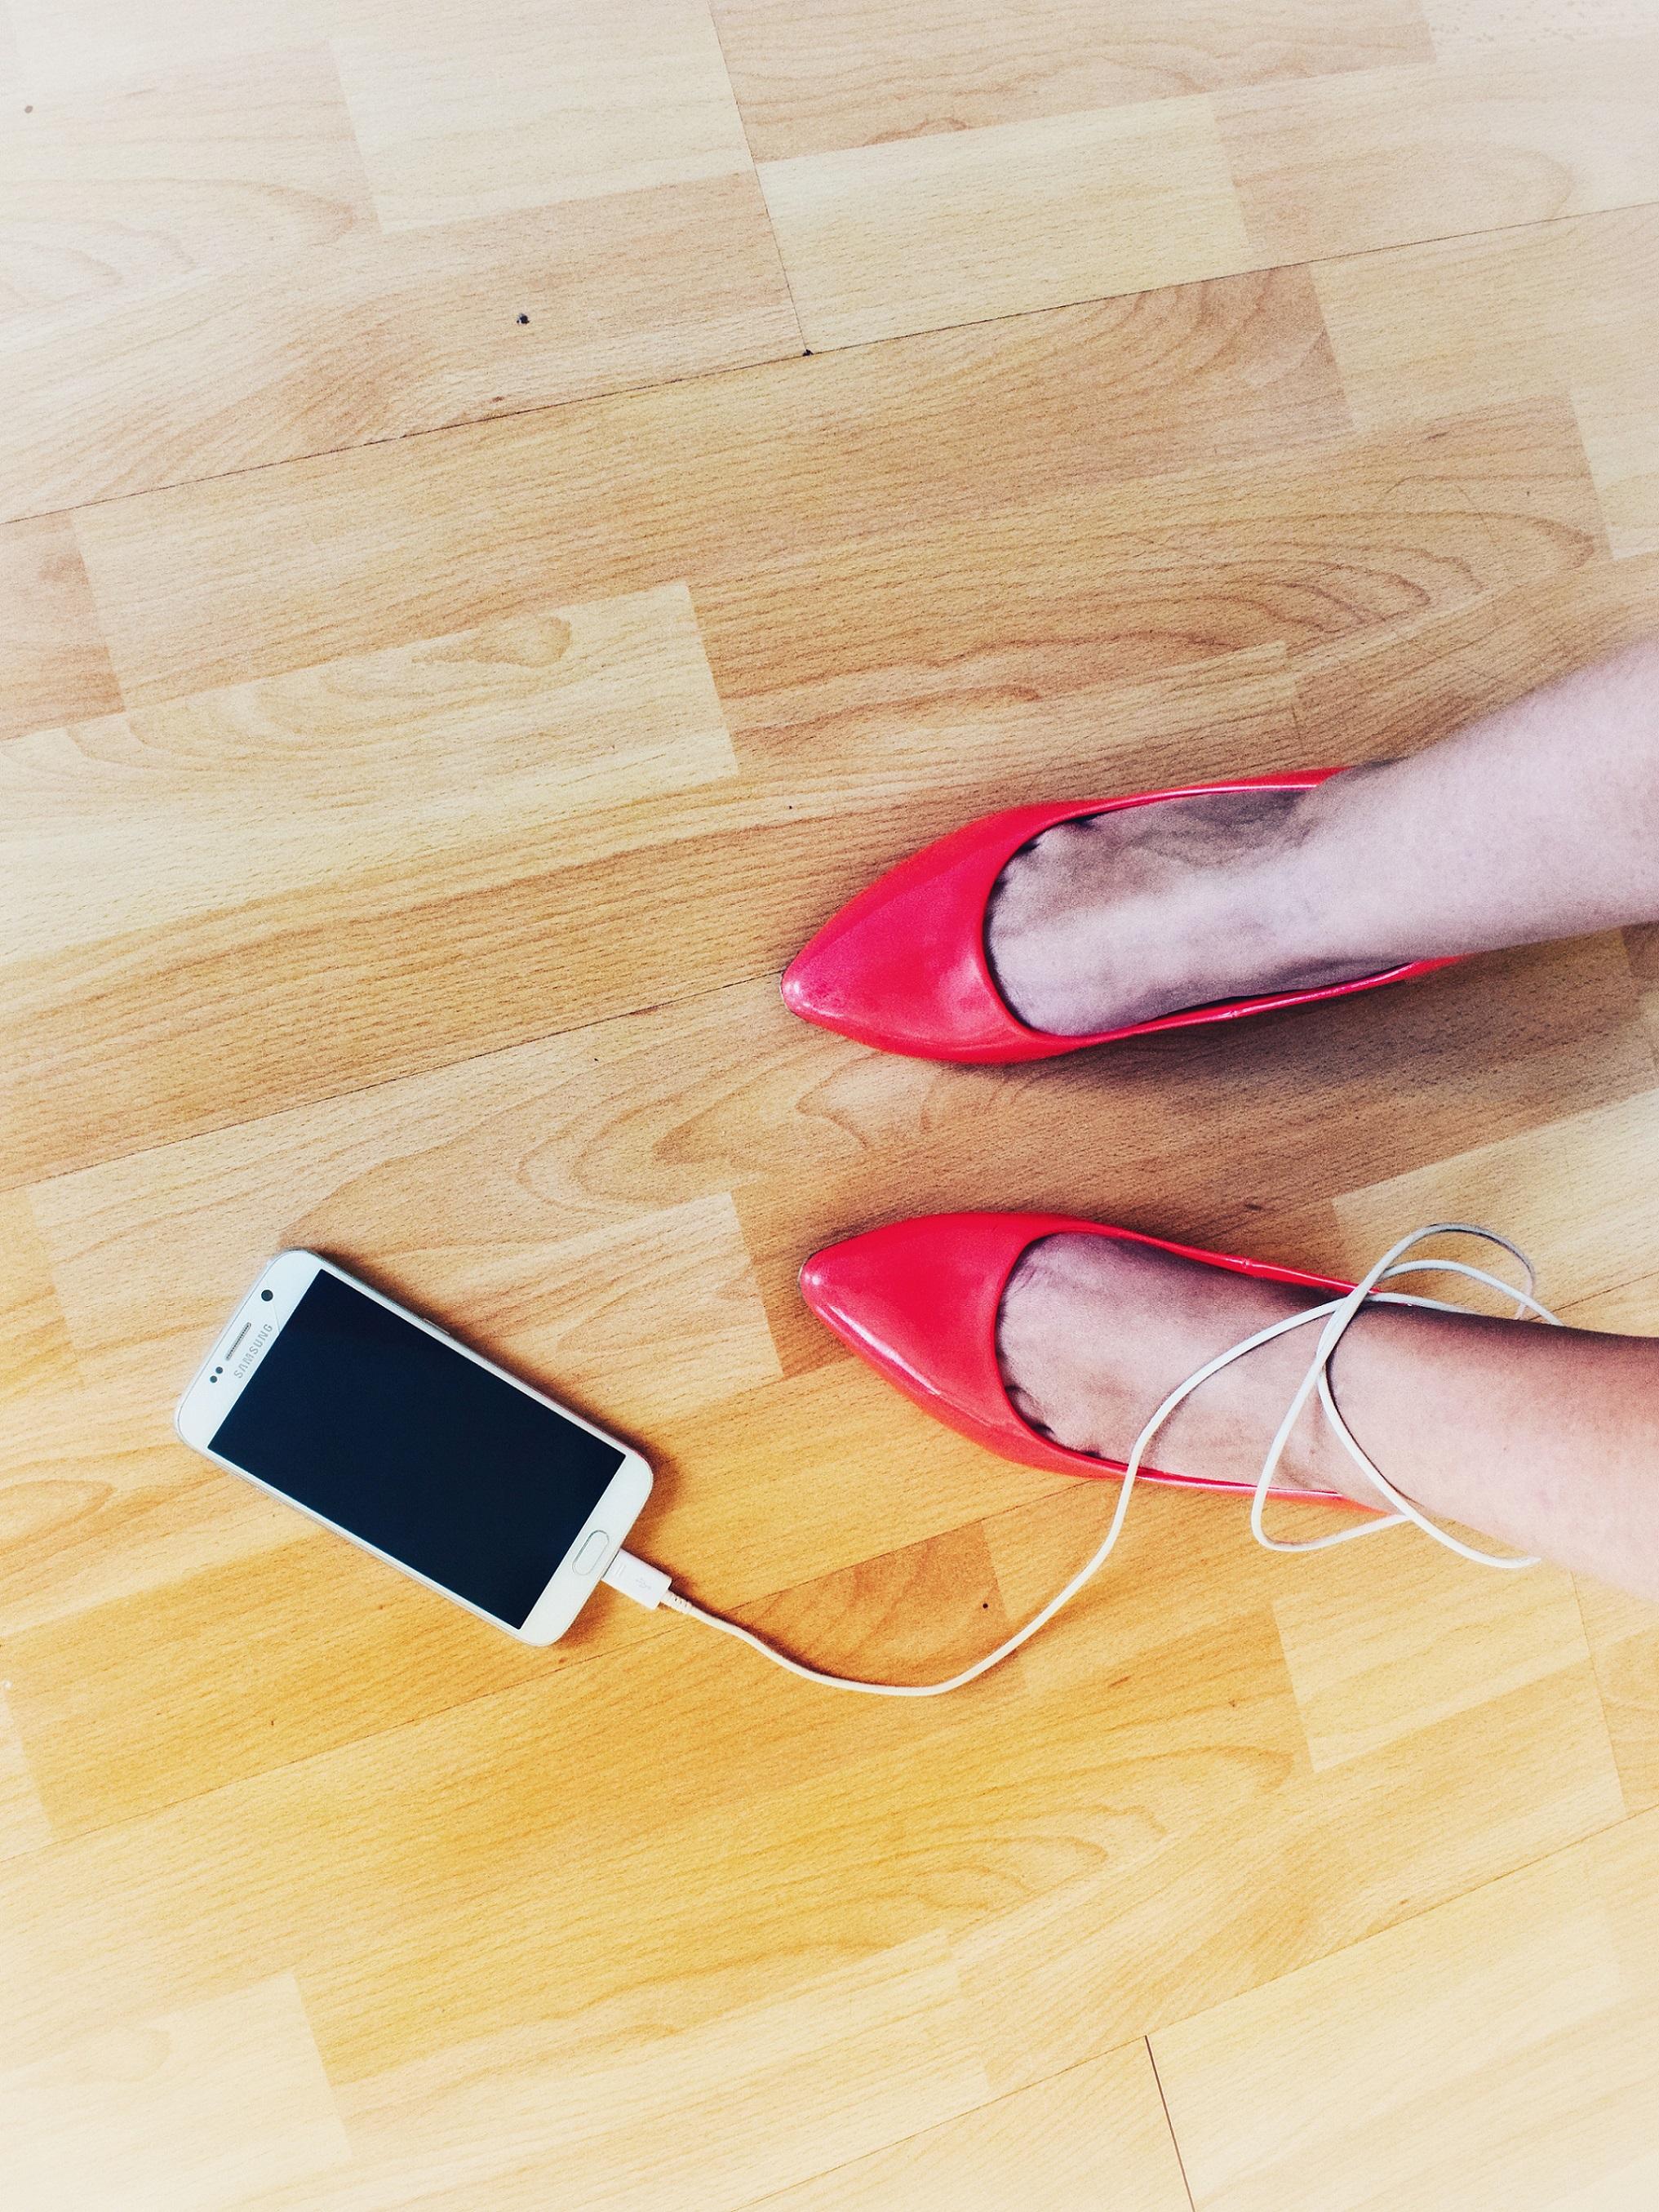 Outlandish blog heartbreak how survive broken heart friend abandon technology obsessed